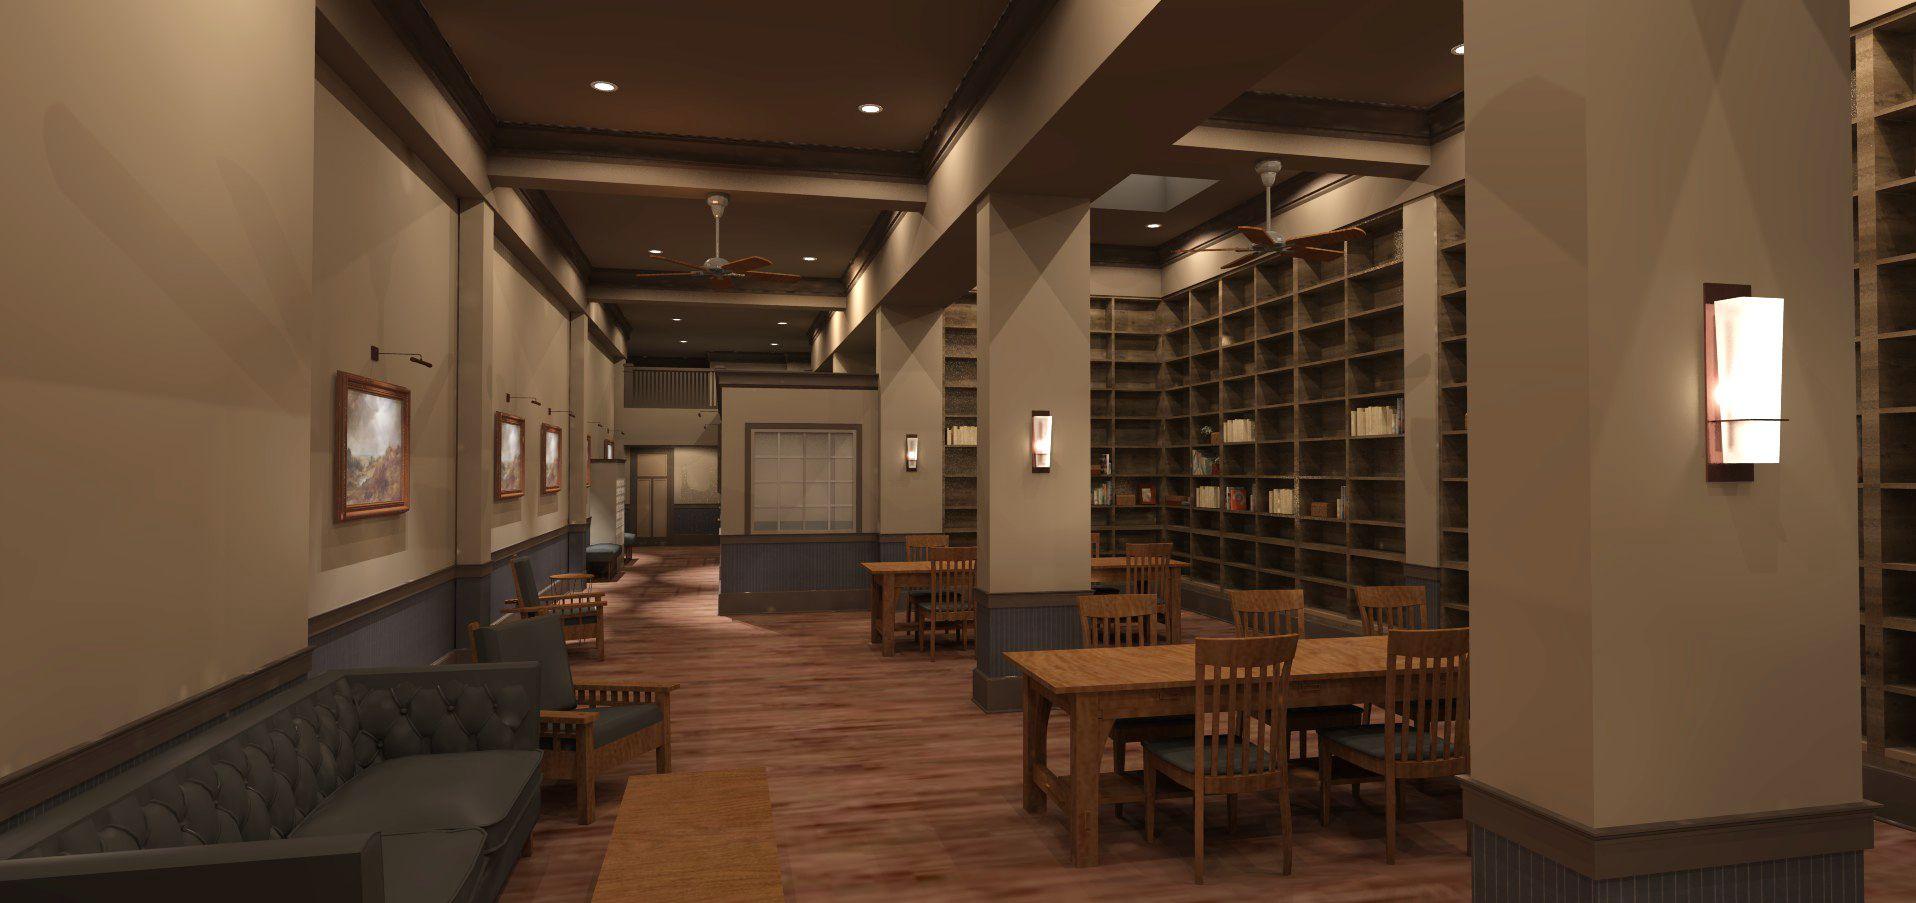 Belvue-lobby-image-2